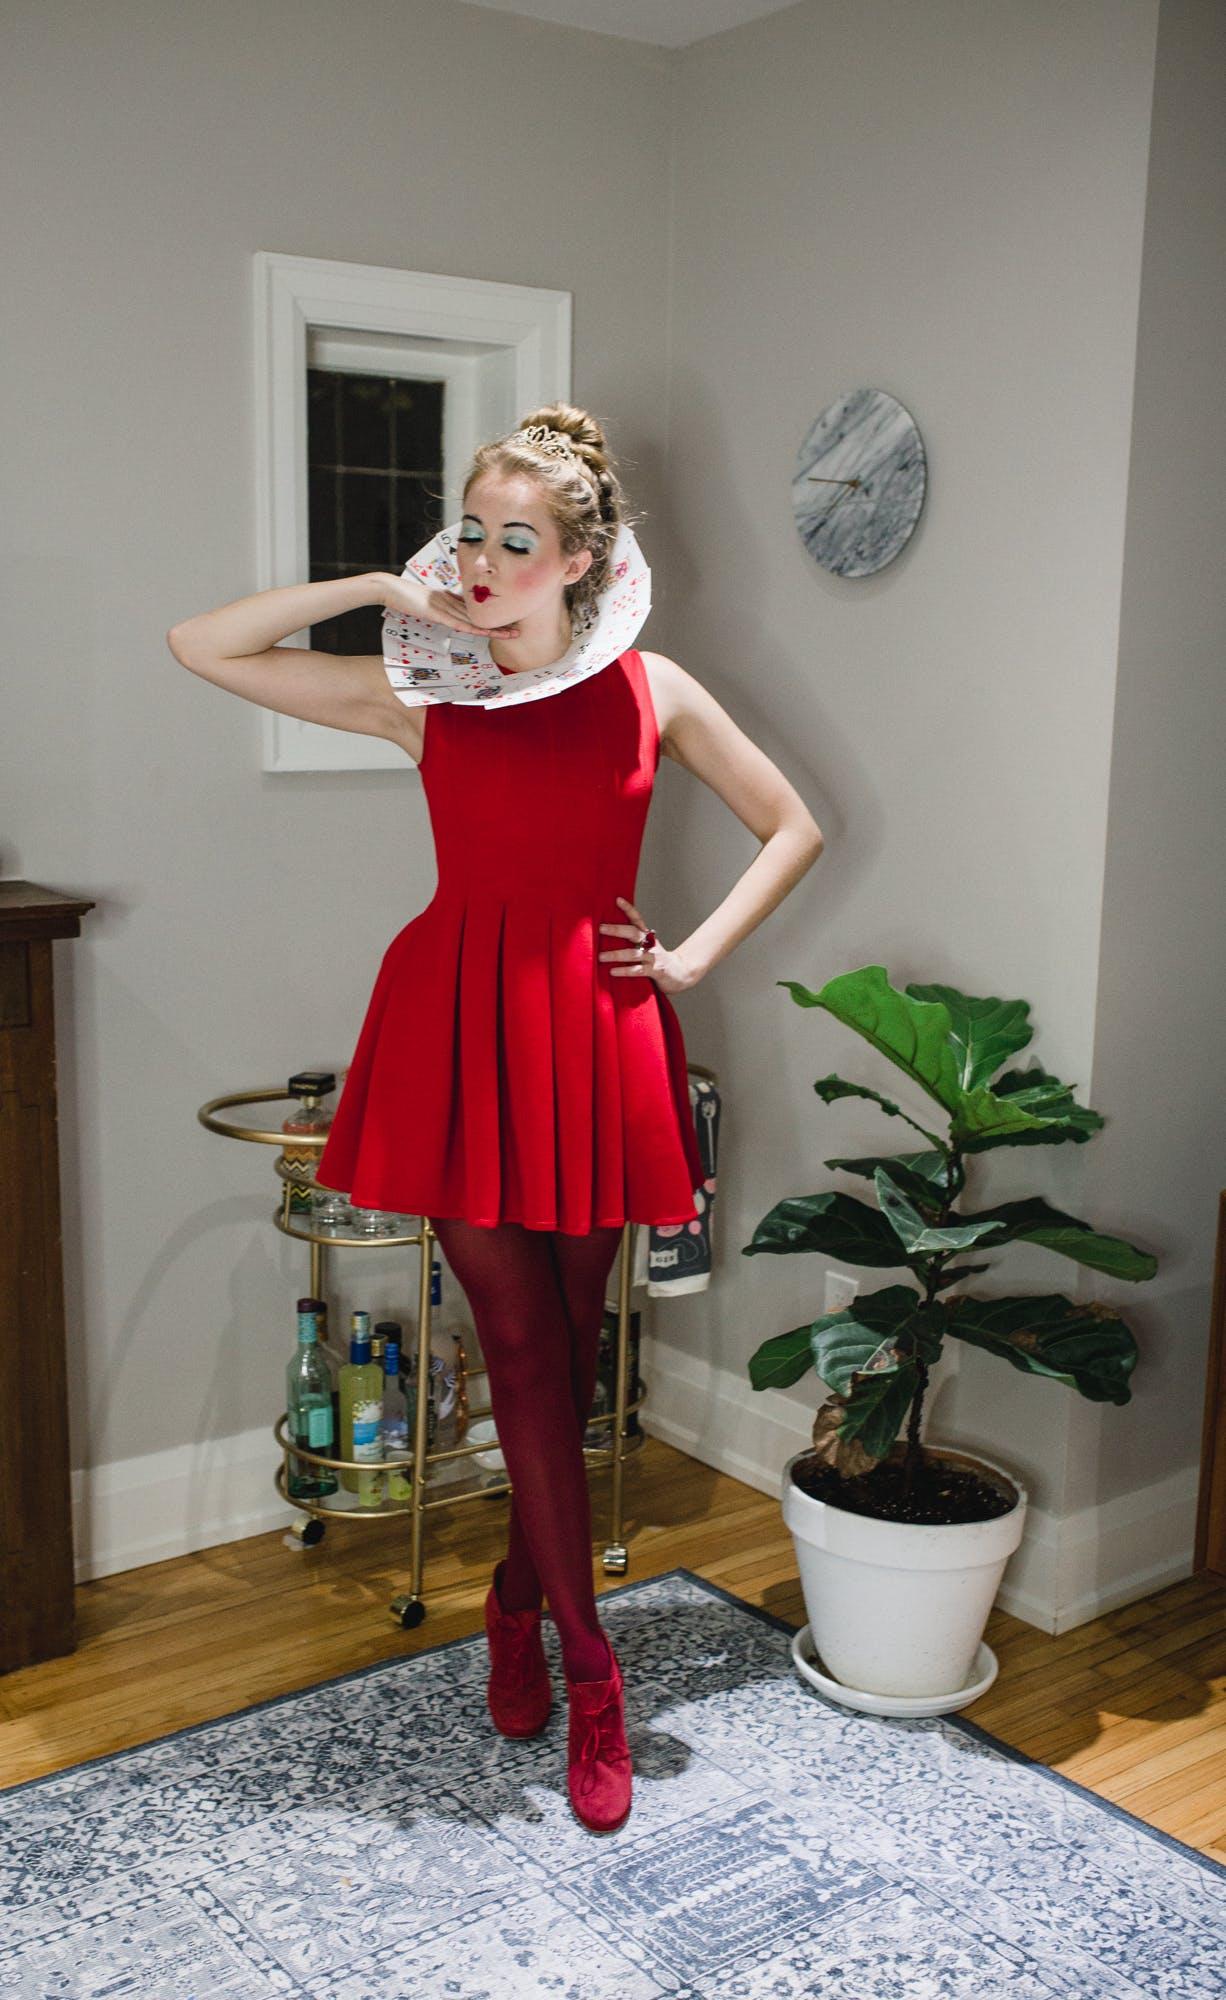 DIY Queen of Hearts Costume - easy, cheap Halloween costume idea